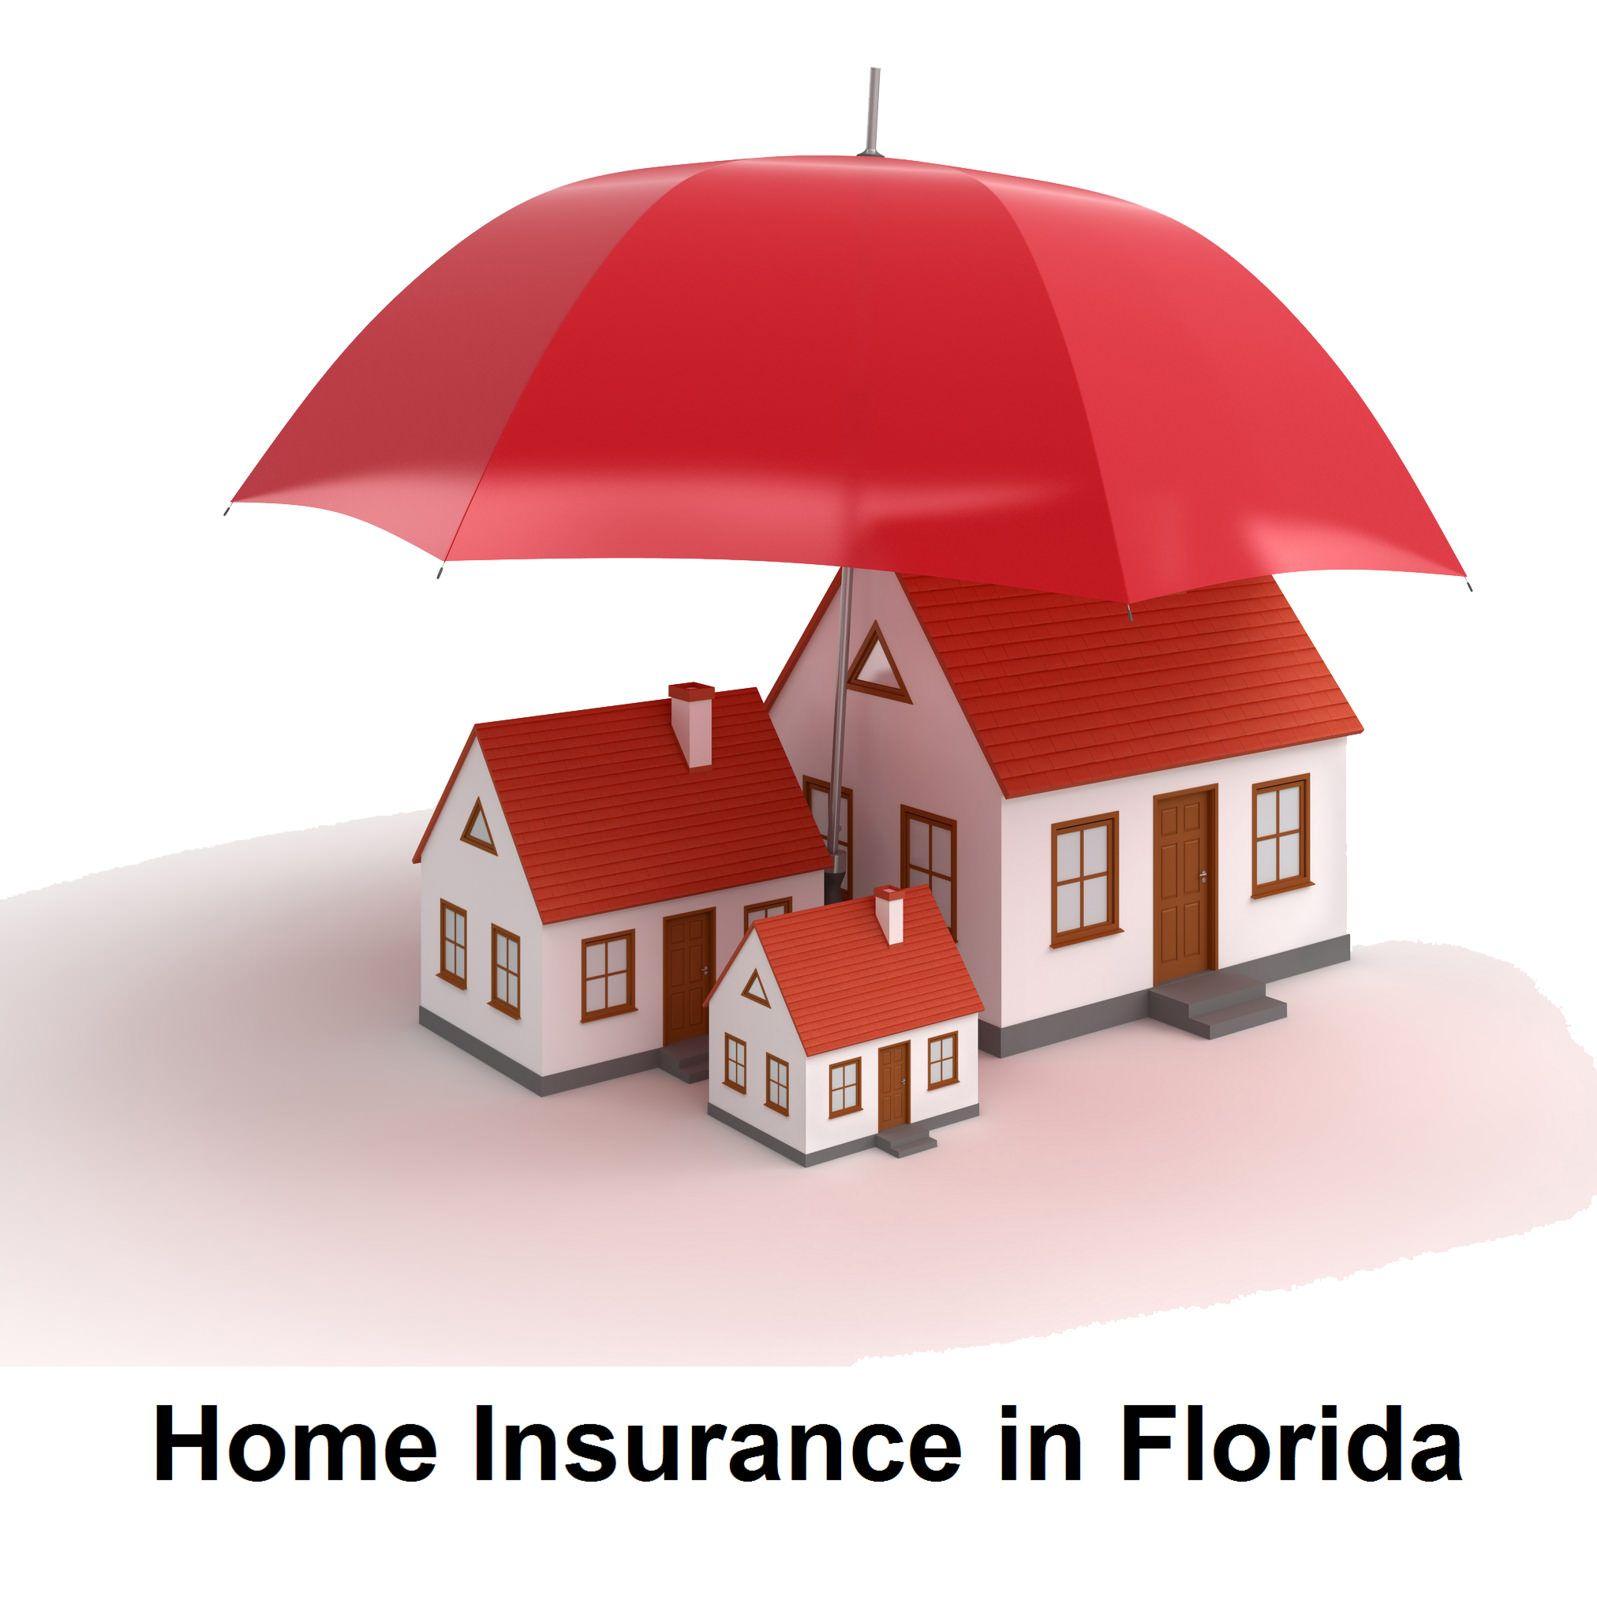 Florida With Images Umbrella Insurance National Life Insurance Car Insurance